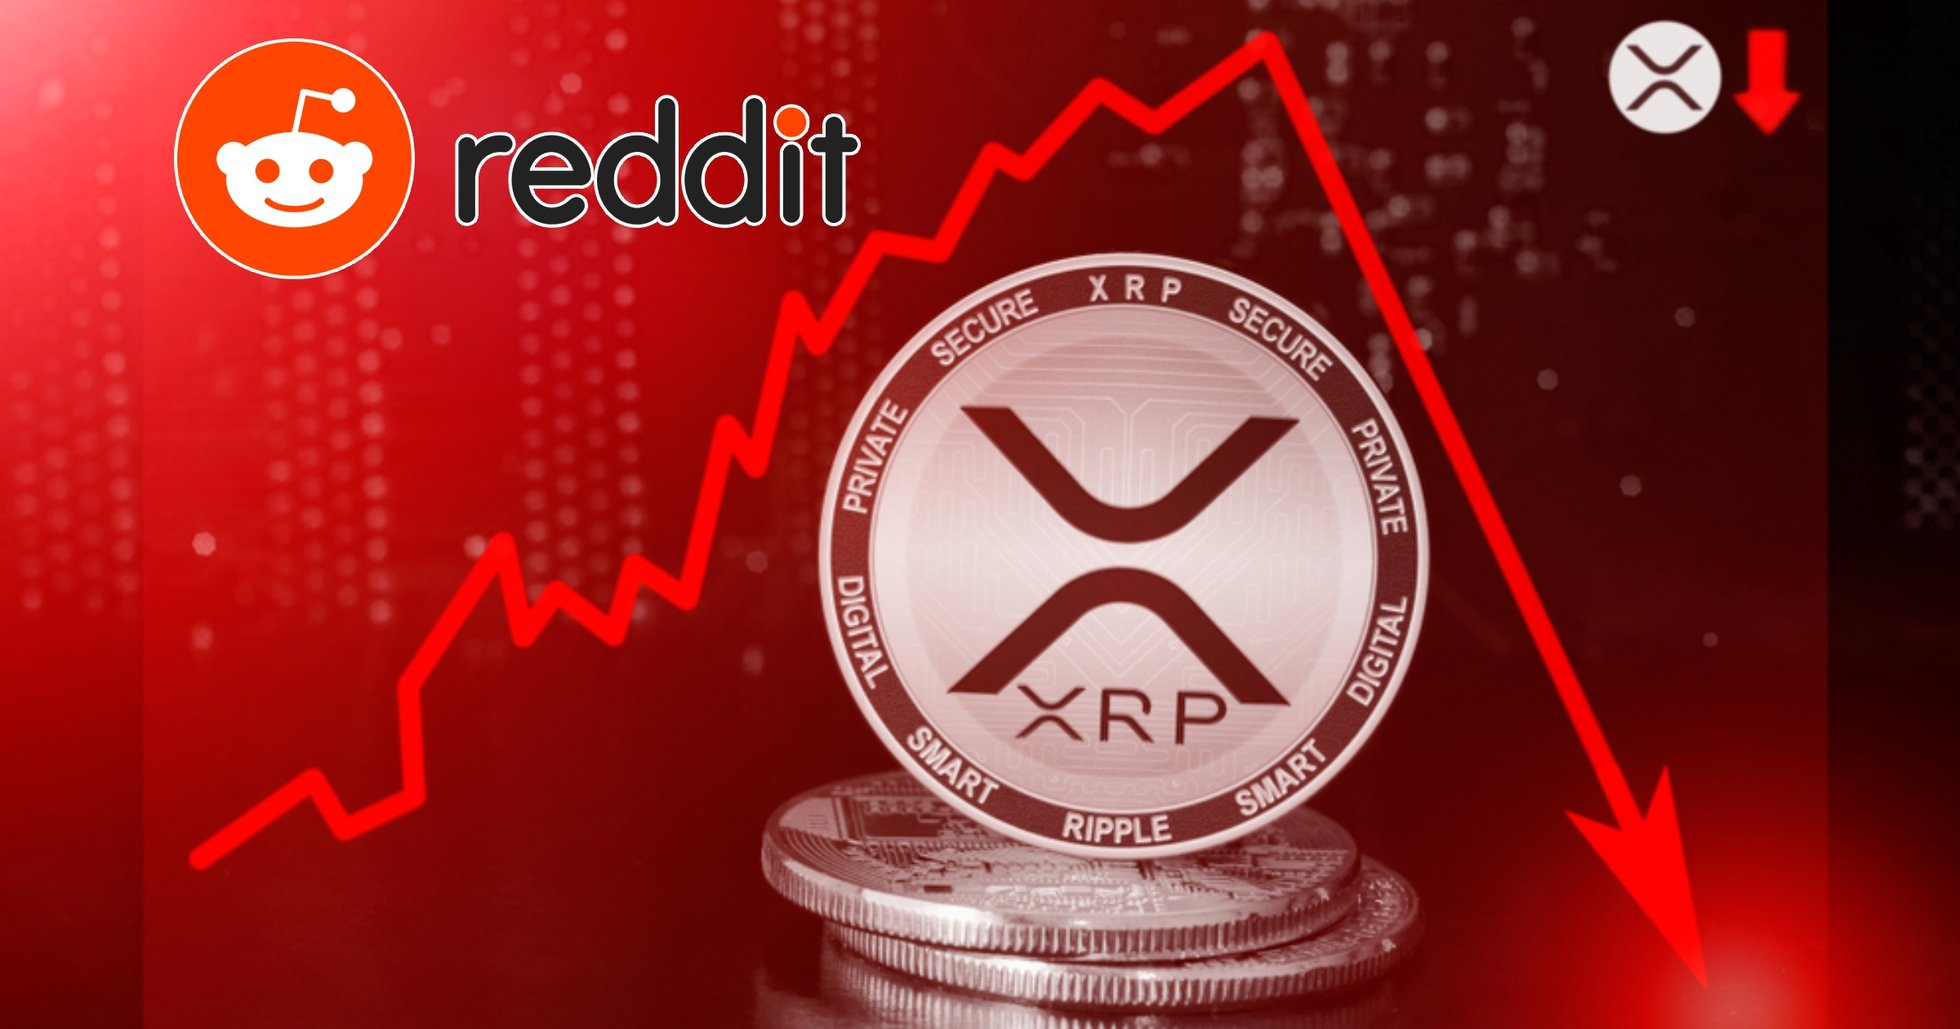 Xrp-priset rasar efter Reddit-rusningen – har tappat över 50 procent